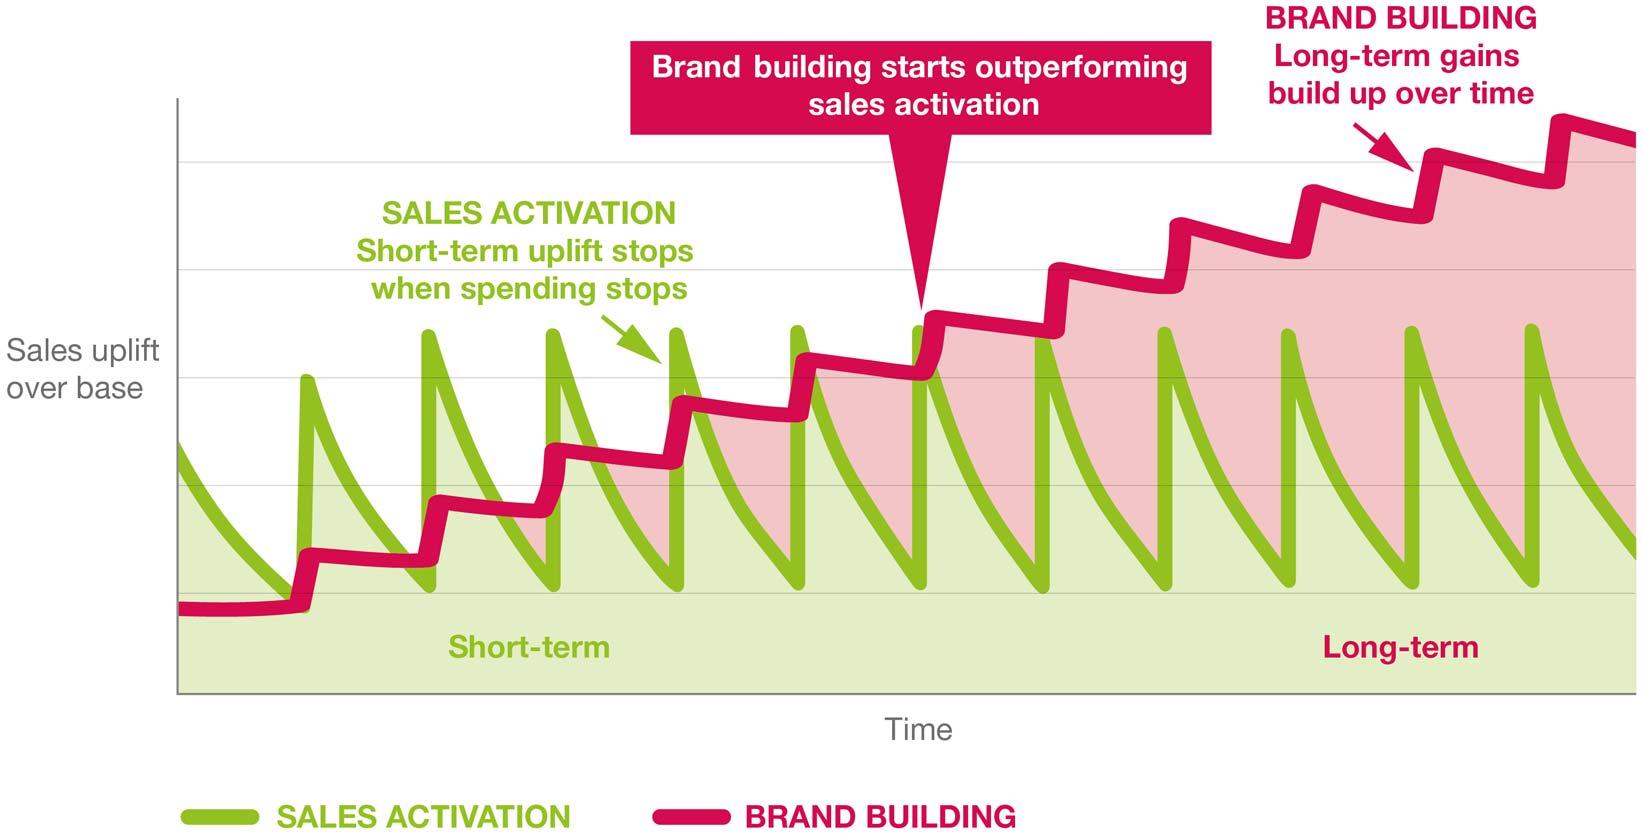 Brand building vs sales activation